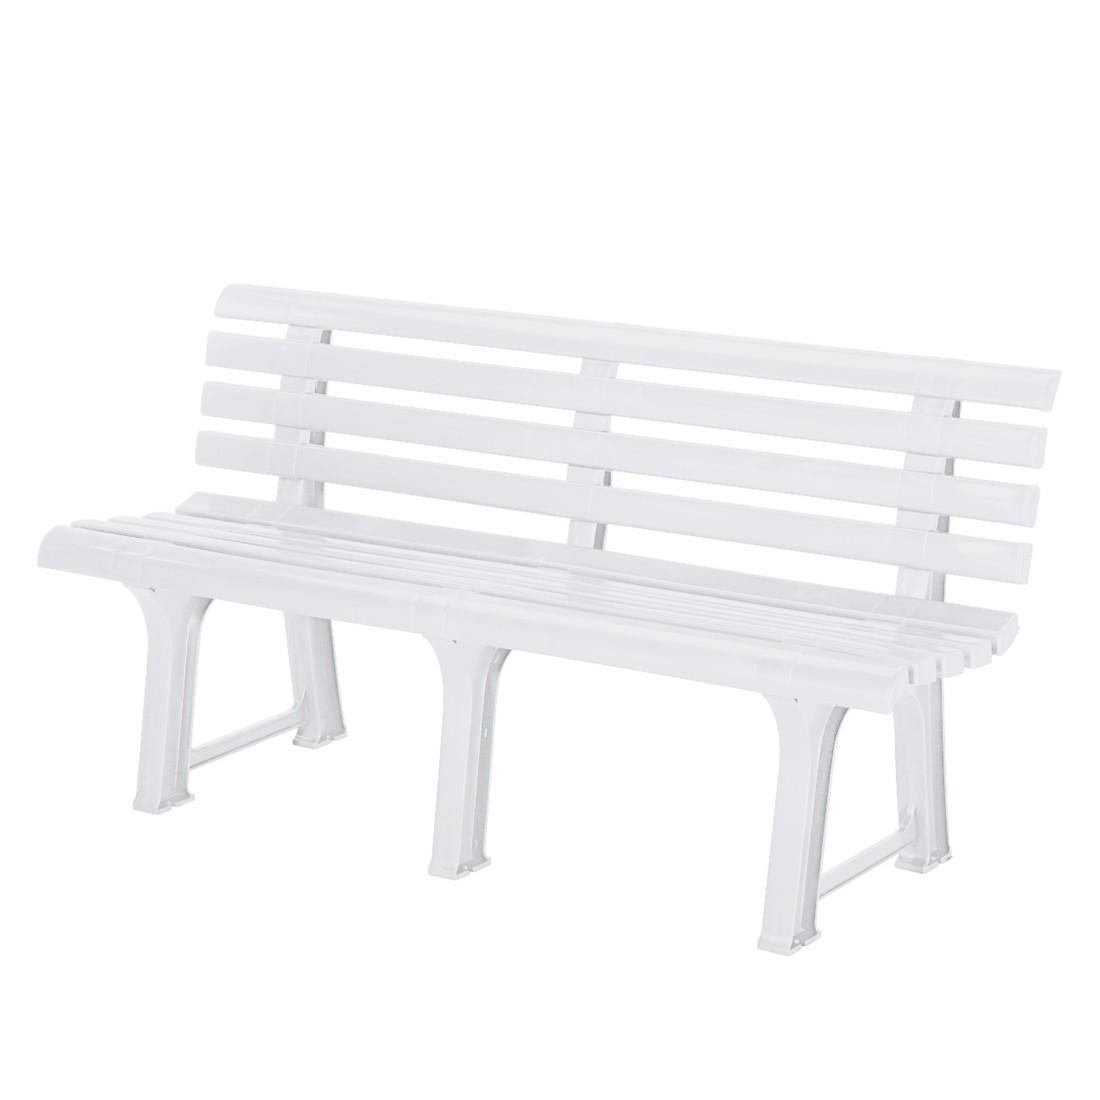 Panca da giardino Bregenz - Materiale plastico bianco sintetico Bianco, Best Freizeitmöbel